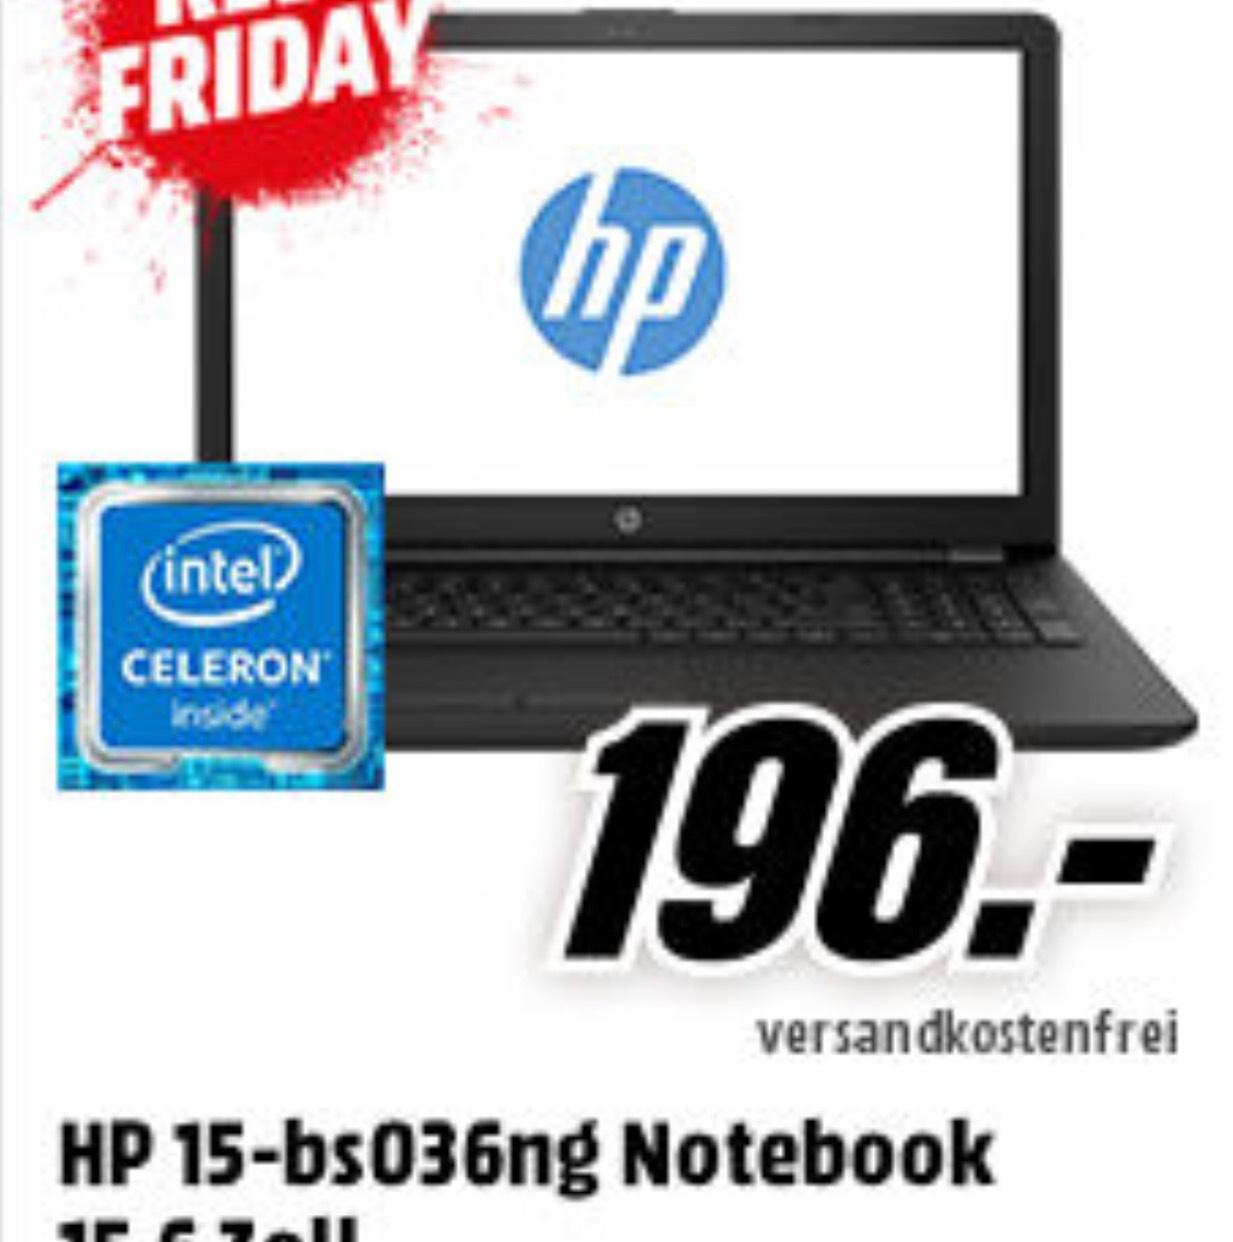 Media-Markt HP BS-036NG